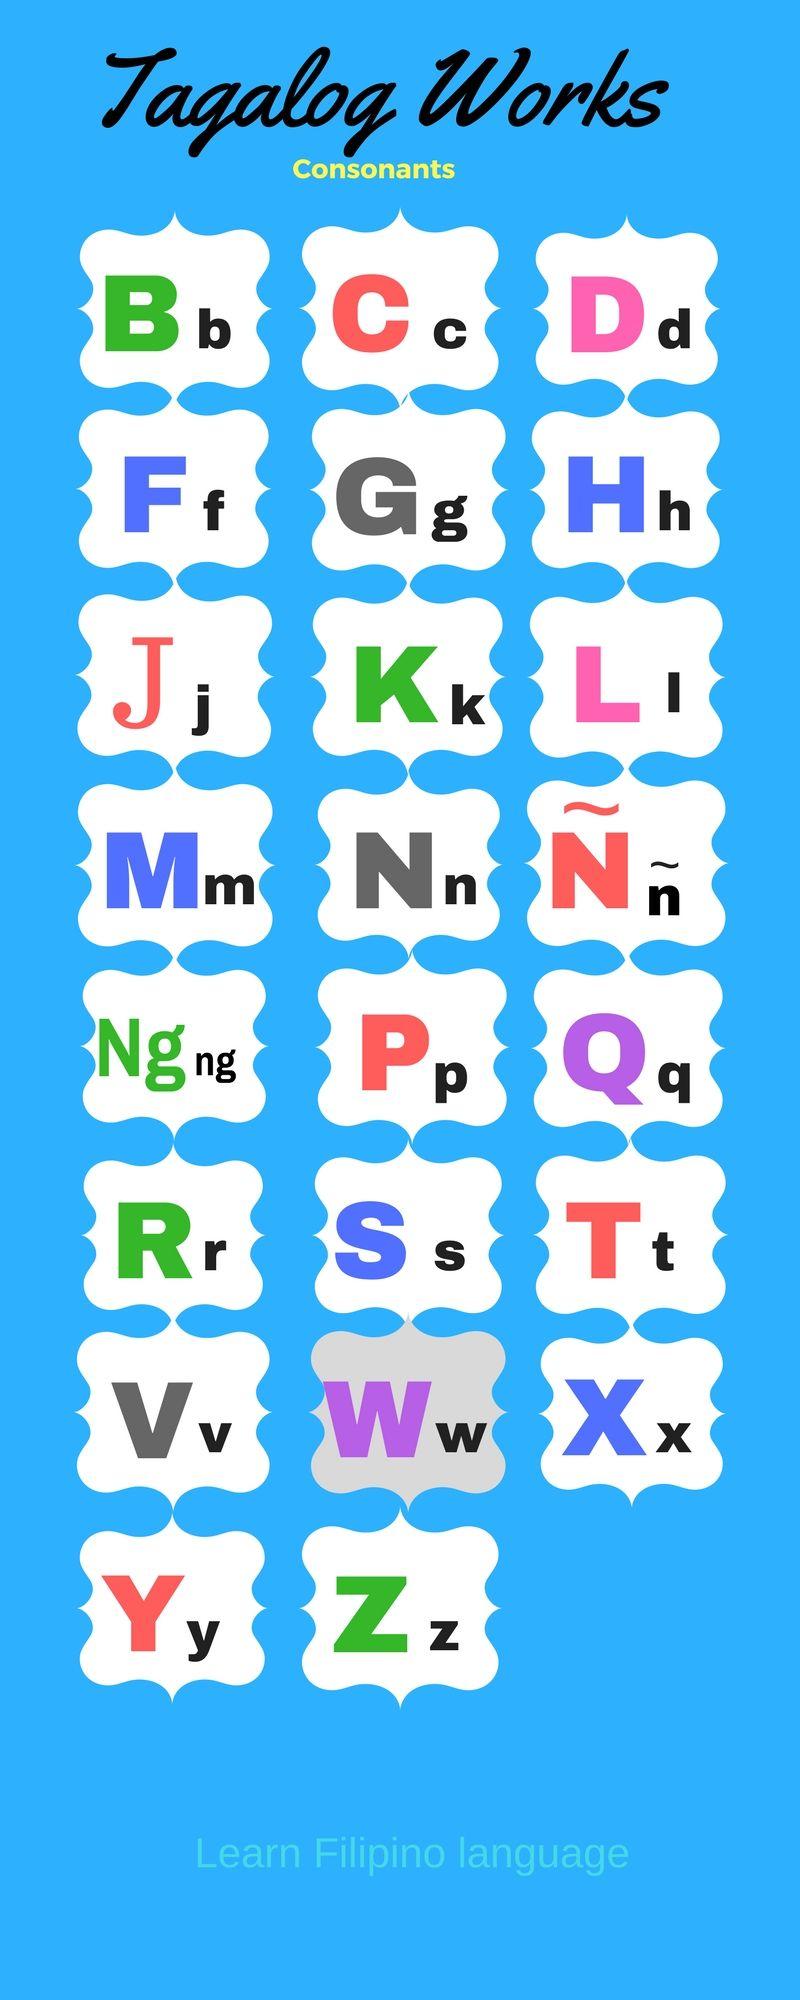 Learn About Filipino Alphabet Consonants Kindergarten Worksheets Tagalog Words Kindergarten Worksheets Printable [ 2000 x 800 Pixel ]